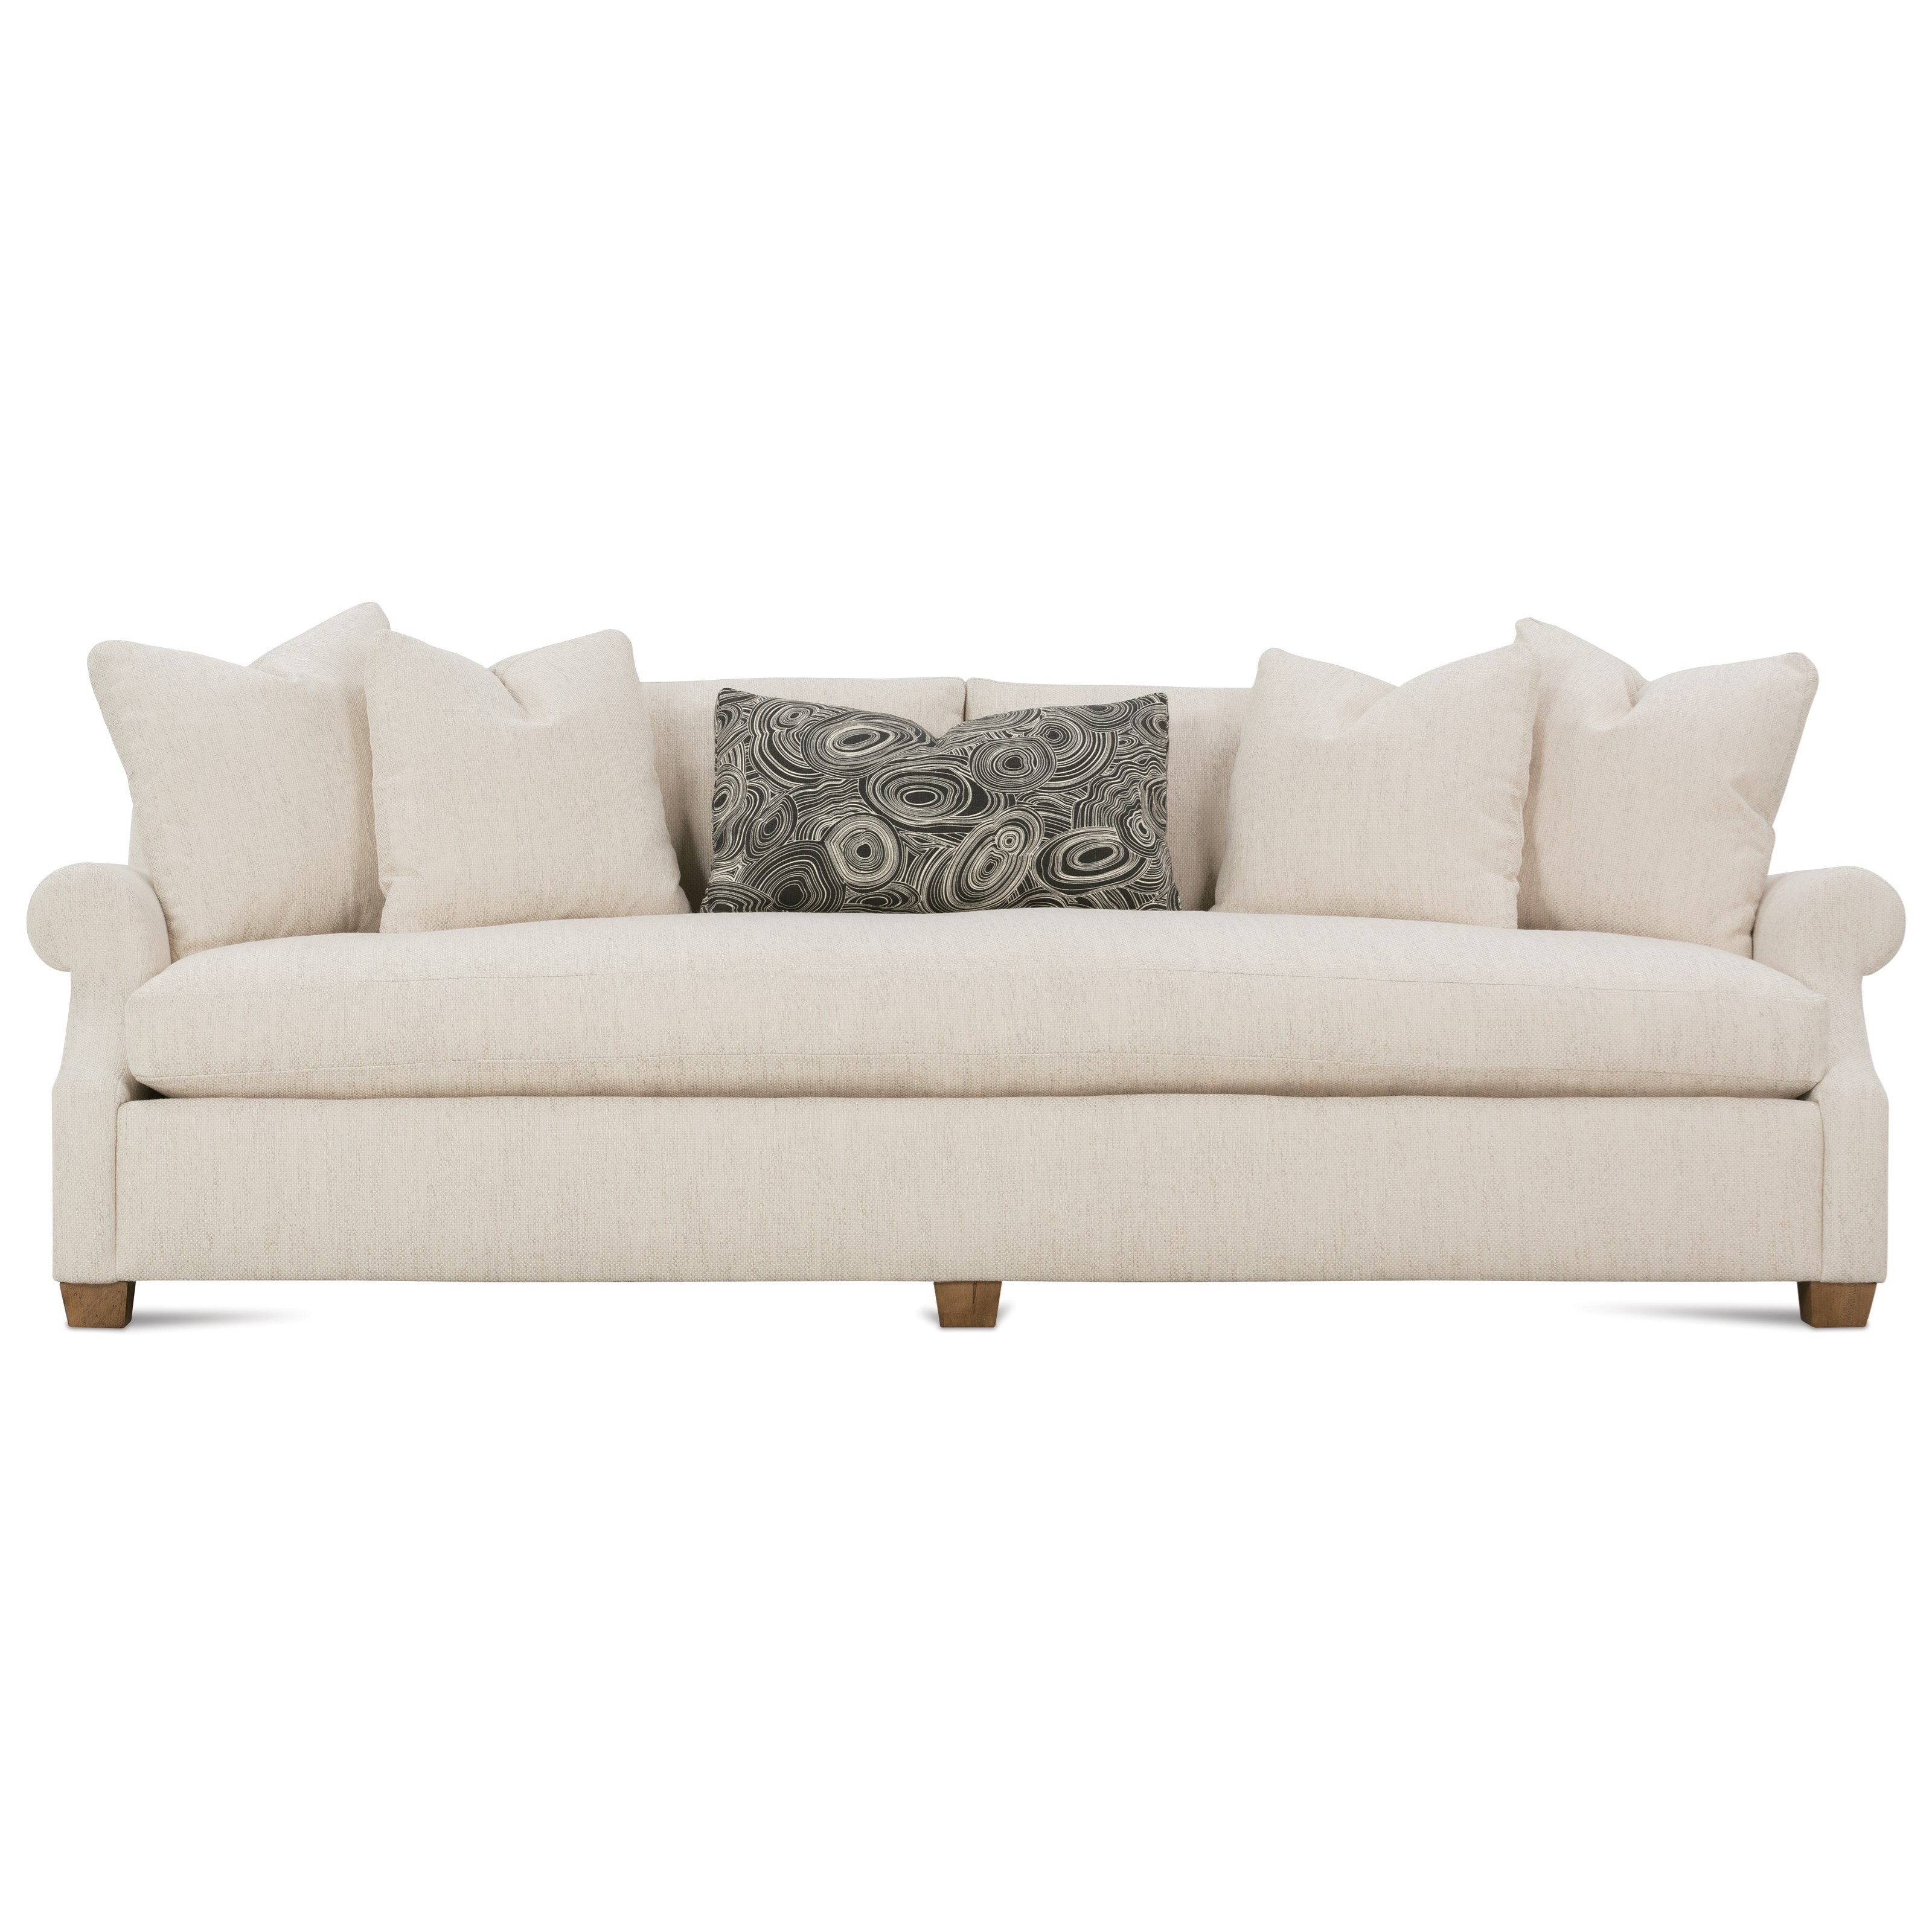 Robin Bruce Bristol Contemporary 98u0027u0027 Sofa With Bench Seat